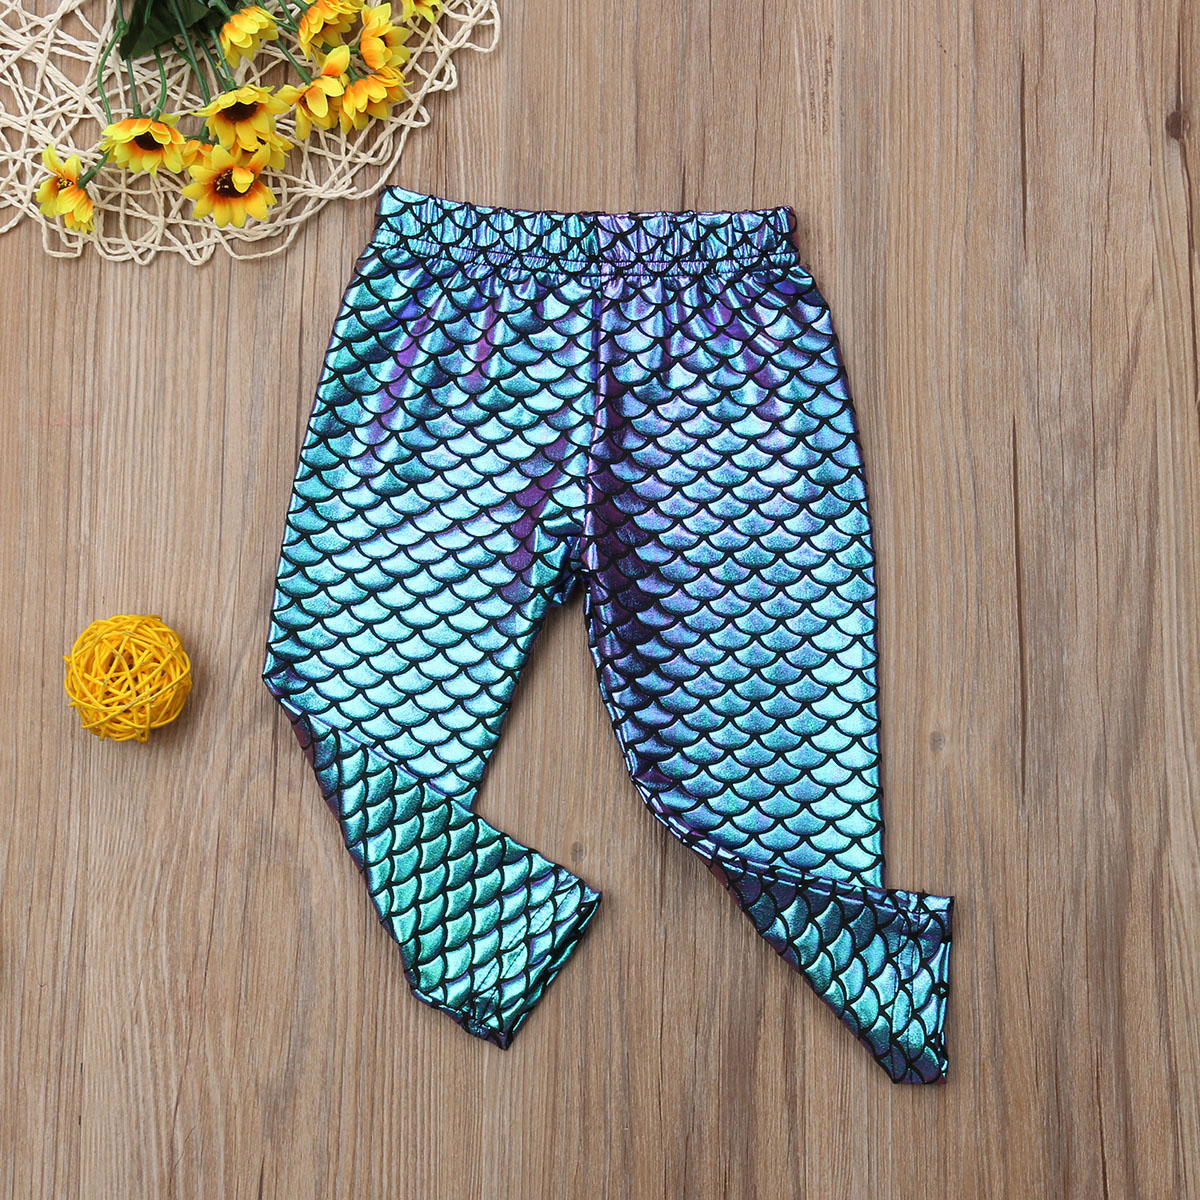 Kid Girl Skinny Mermaid Shiny Fish Scale Leggings Stretchy Pants Pencil Trousers